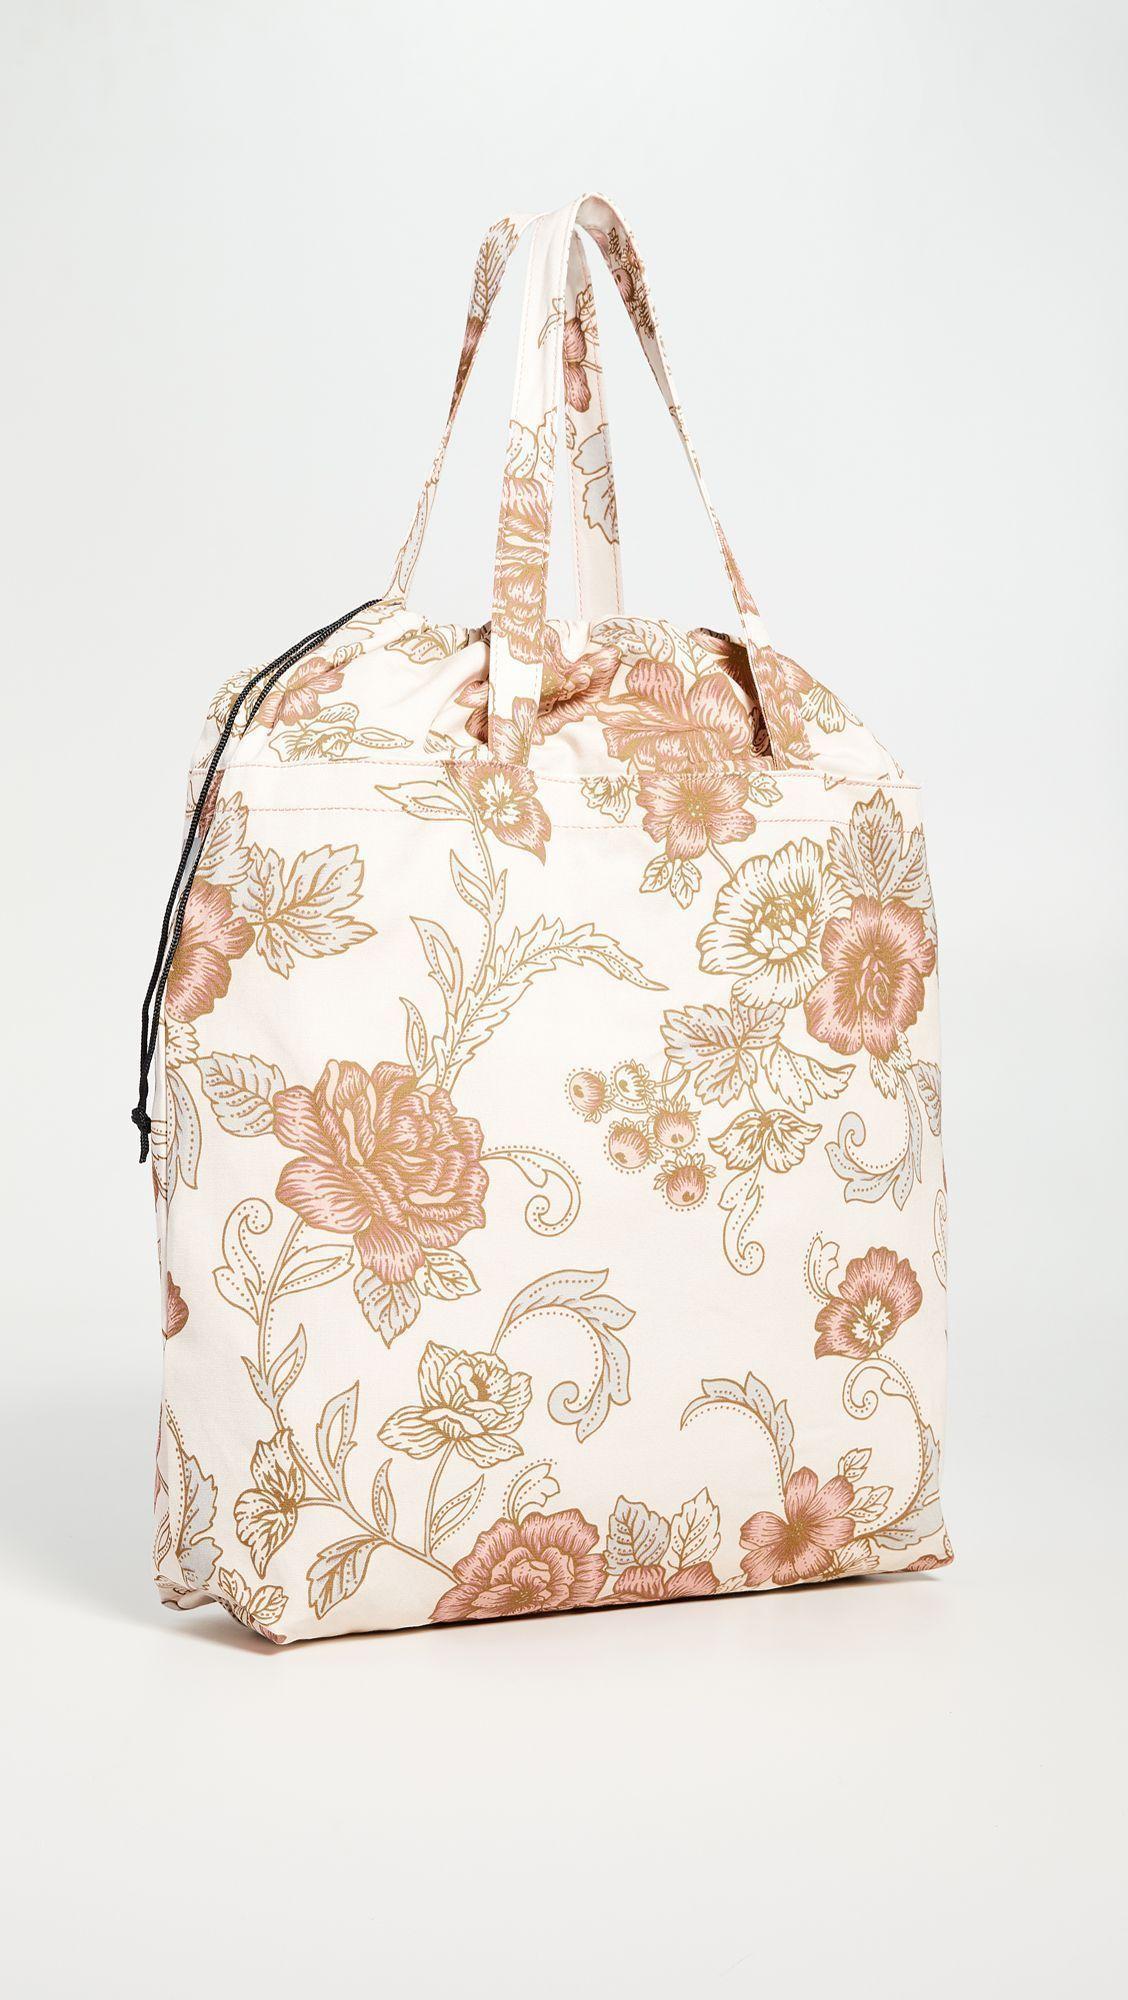 See By Chloe Tote Bag See by Chloe See By Chloe Tote Bag  See By Chloe Tote Bag See by Chloe See By Chloe Tote Bag  See By Chloe Tote Bag See by Chloe See By Chloe Tote B...